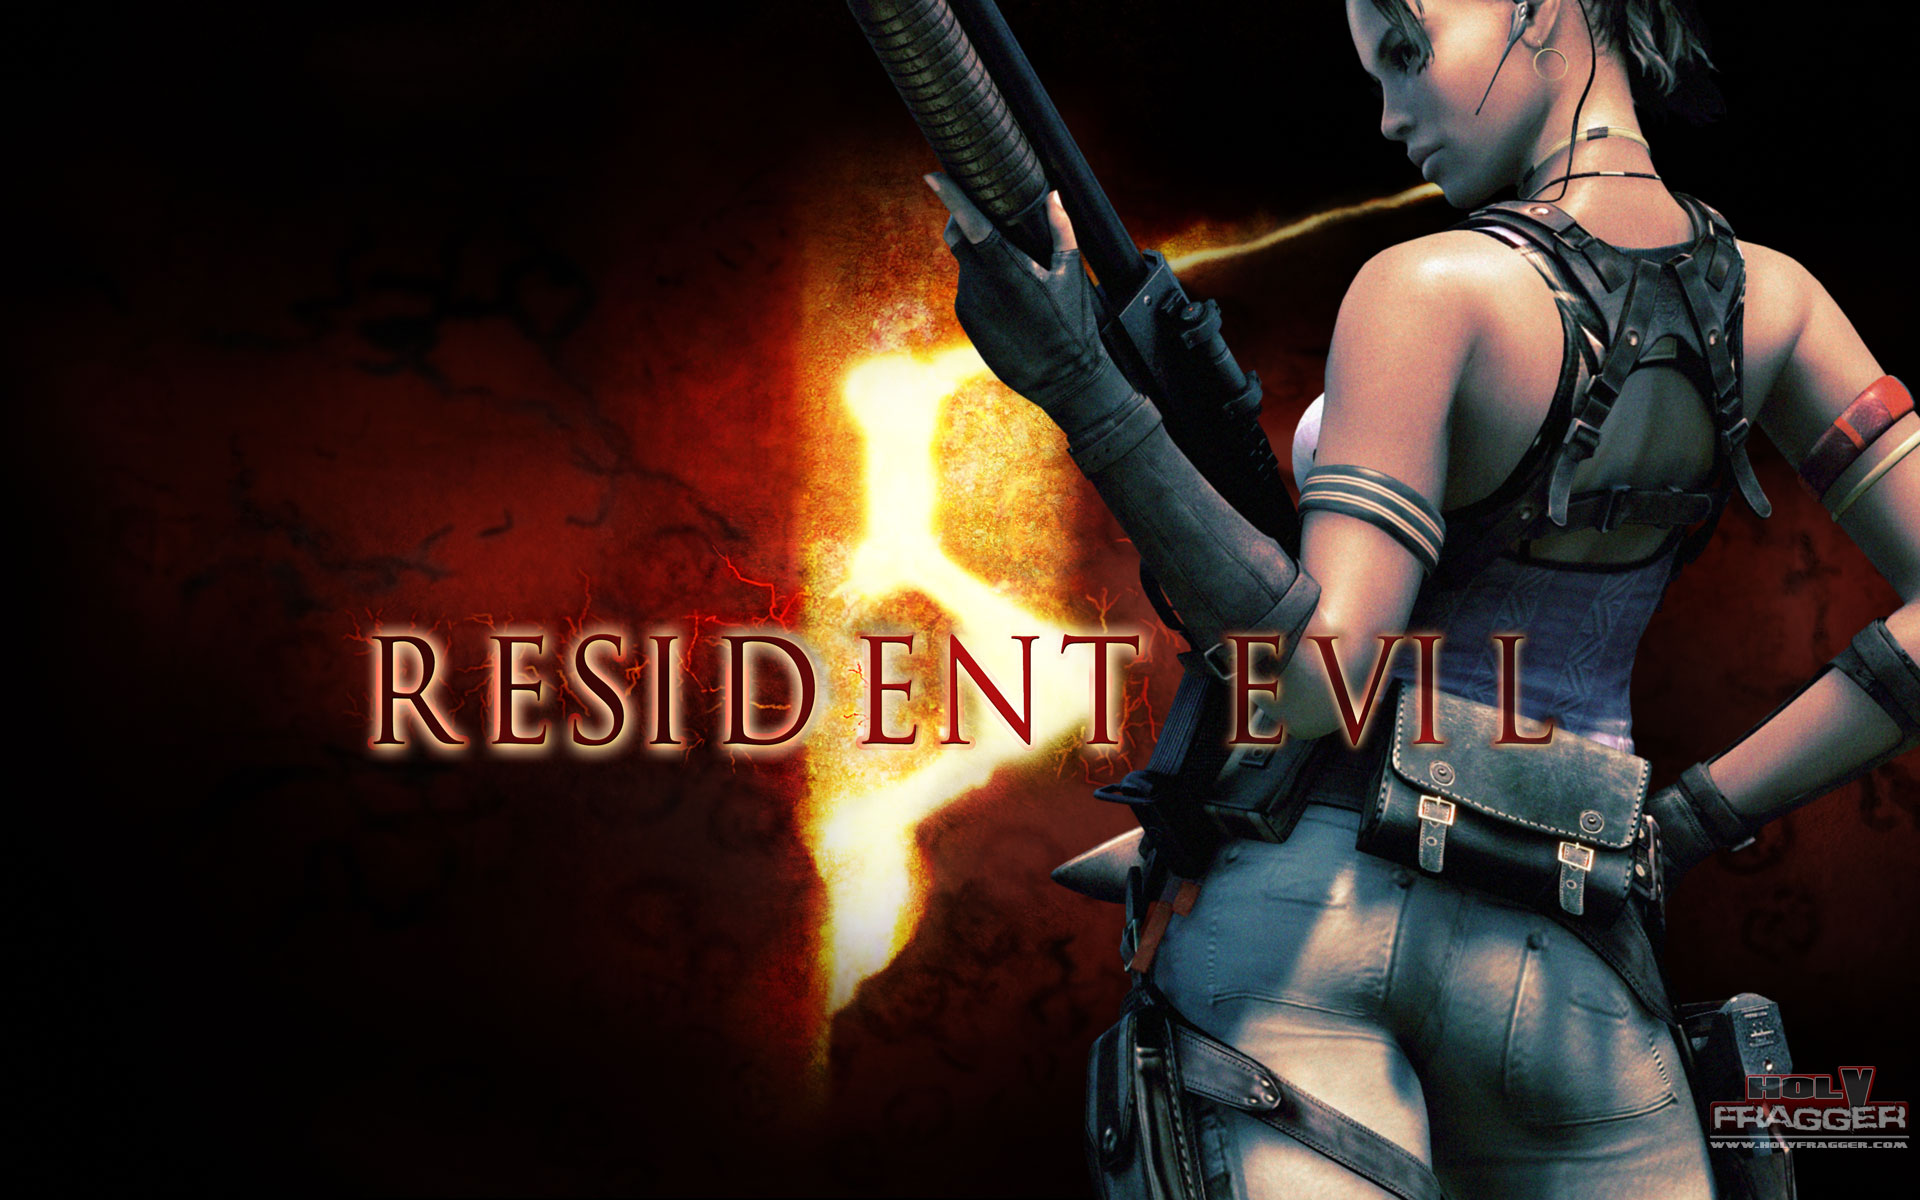 how to play sheva in resident evil 5